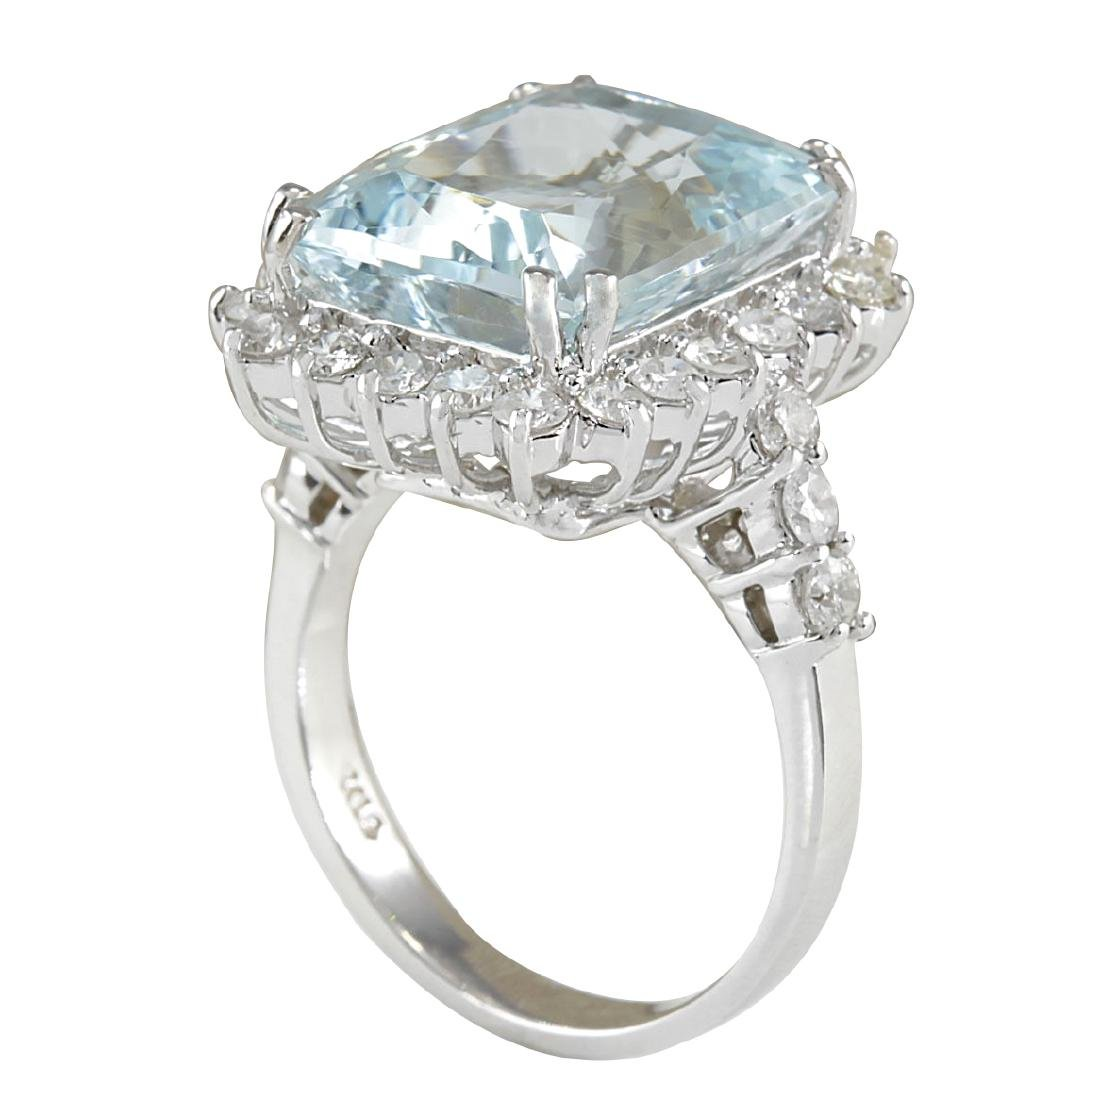 10.55CTW Natural Aquamarine And Diamond Ring In 18K - 3